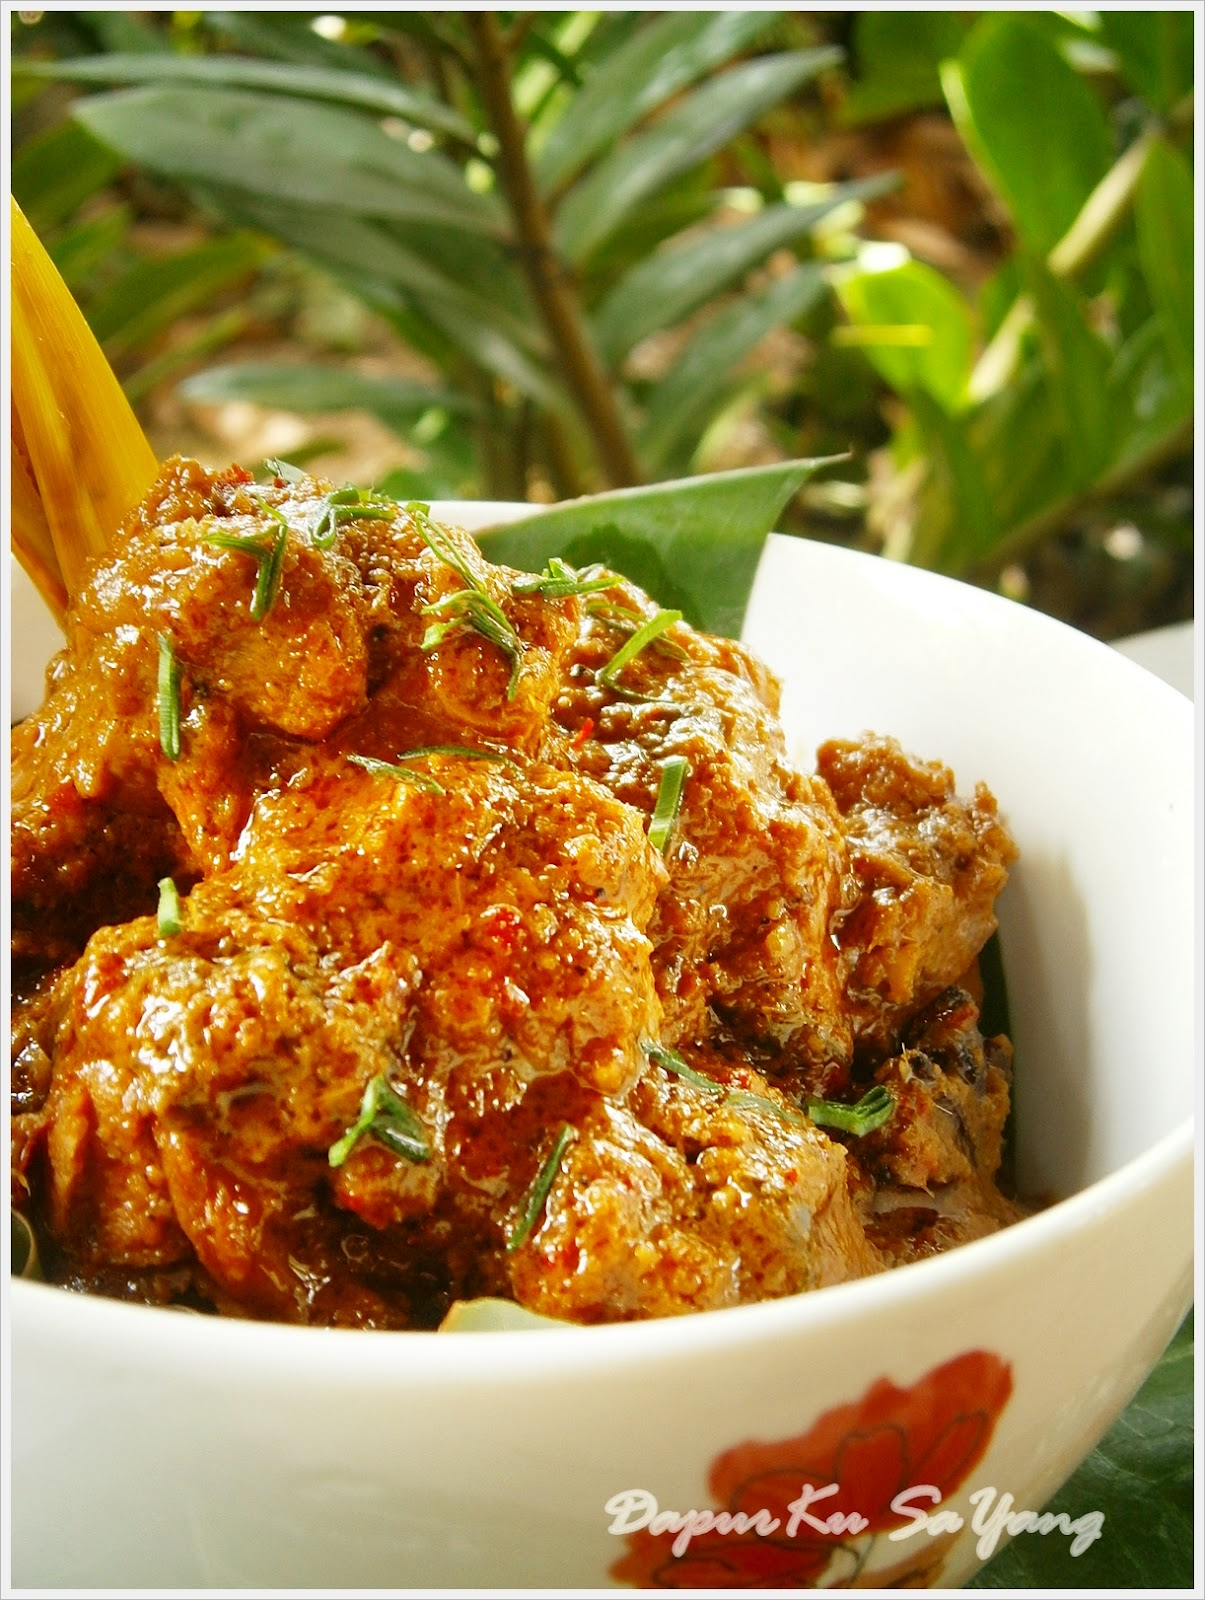 dapurku sayang rendang ayam rindunya nak blogging semula Resepi Rendang Ayam Melaka Enak dan Mudah